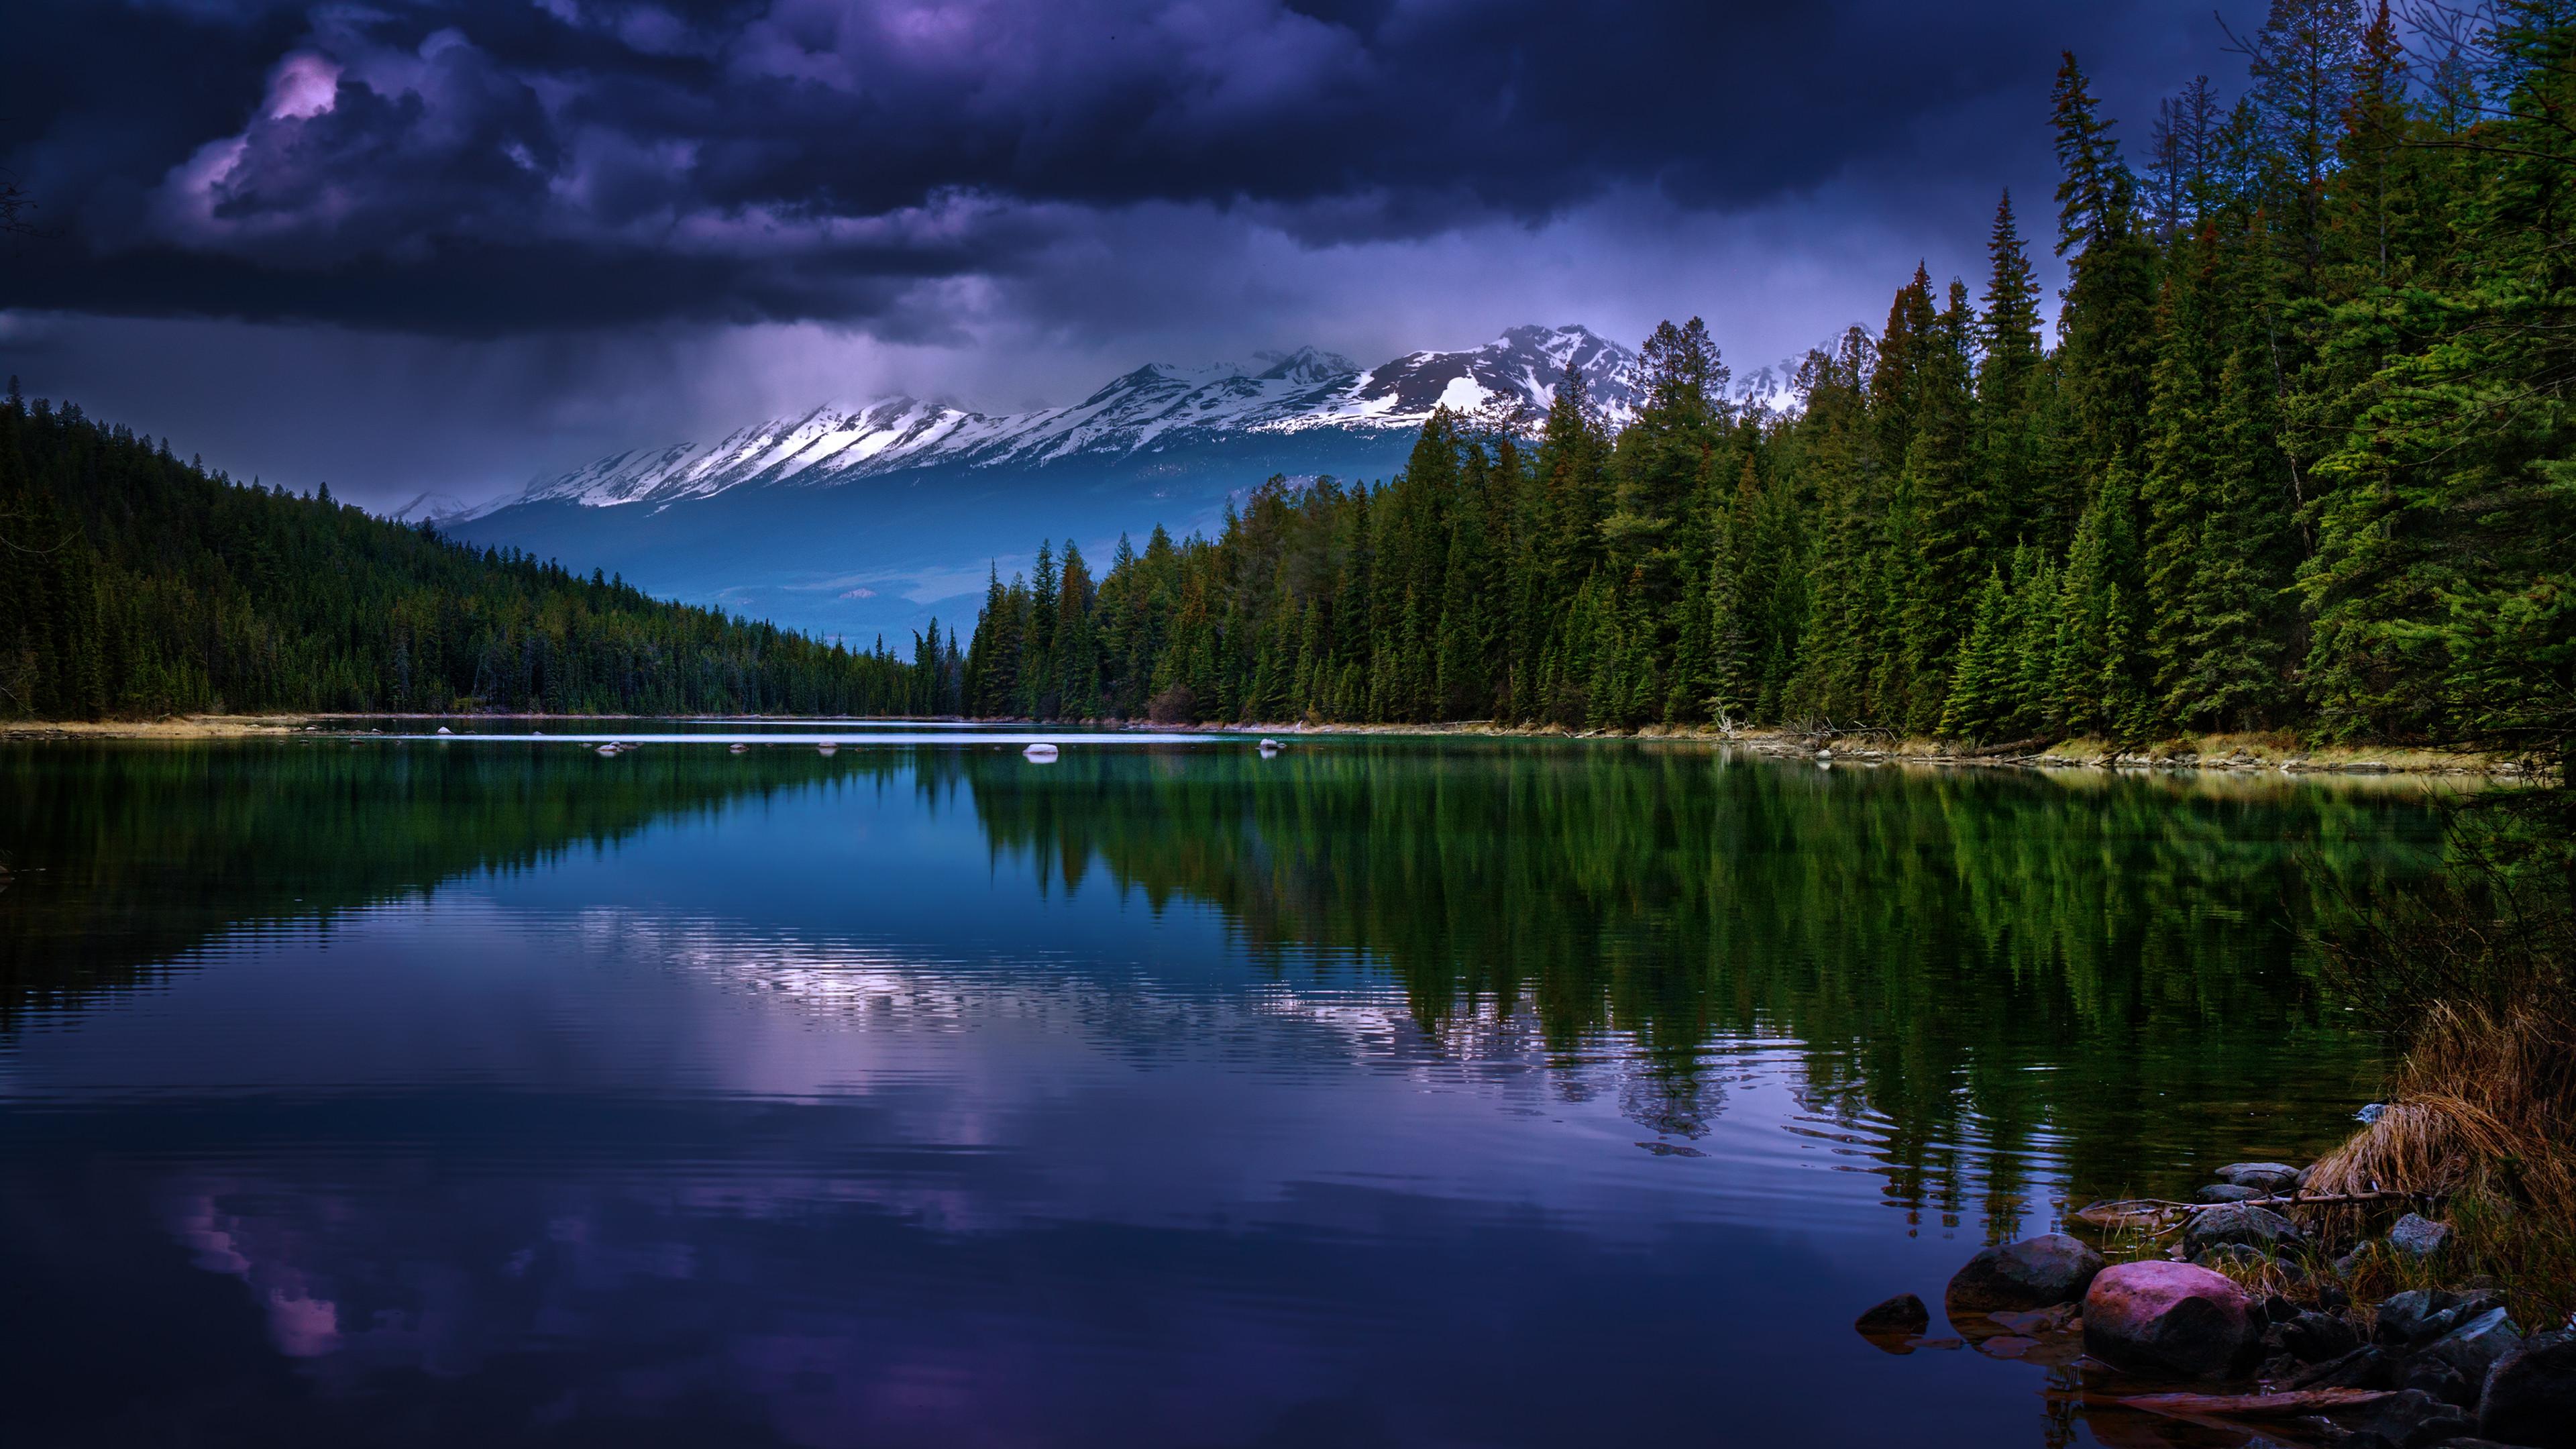 Res: 3840x2160, Earth - Reflection Mountain Wallpaper